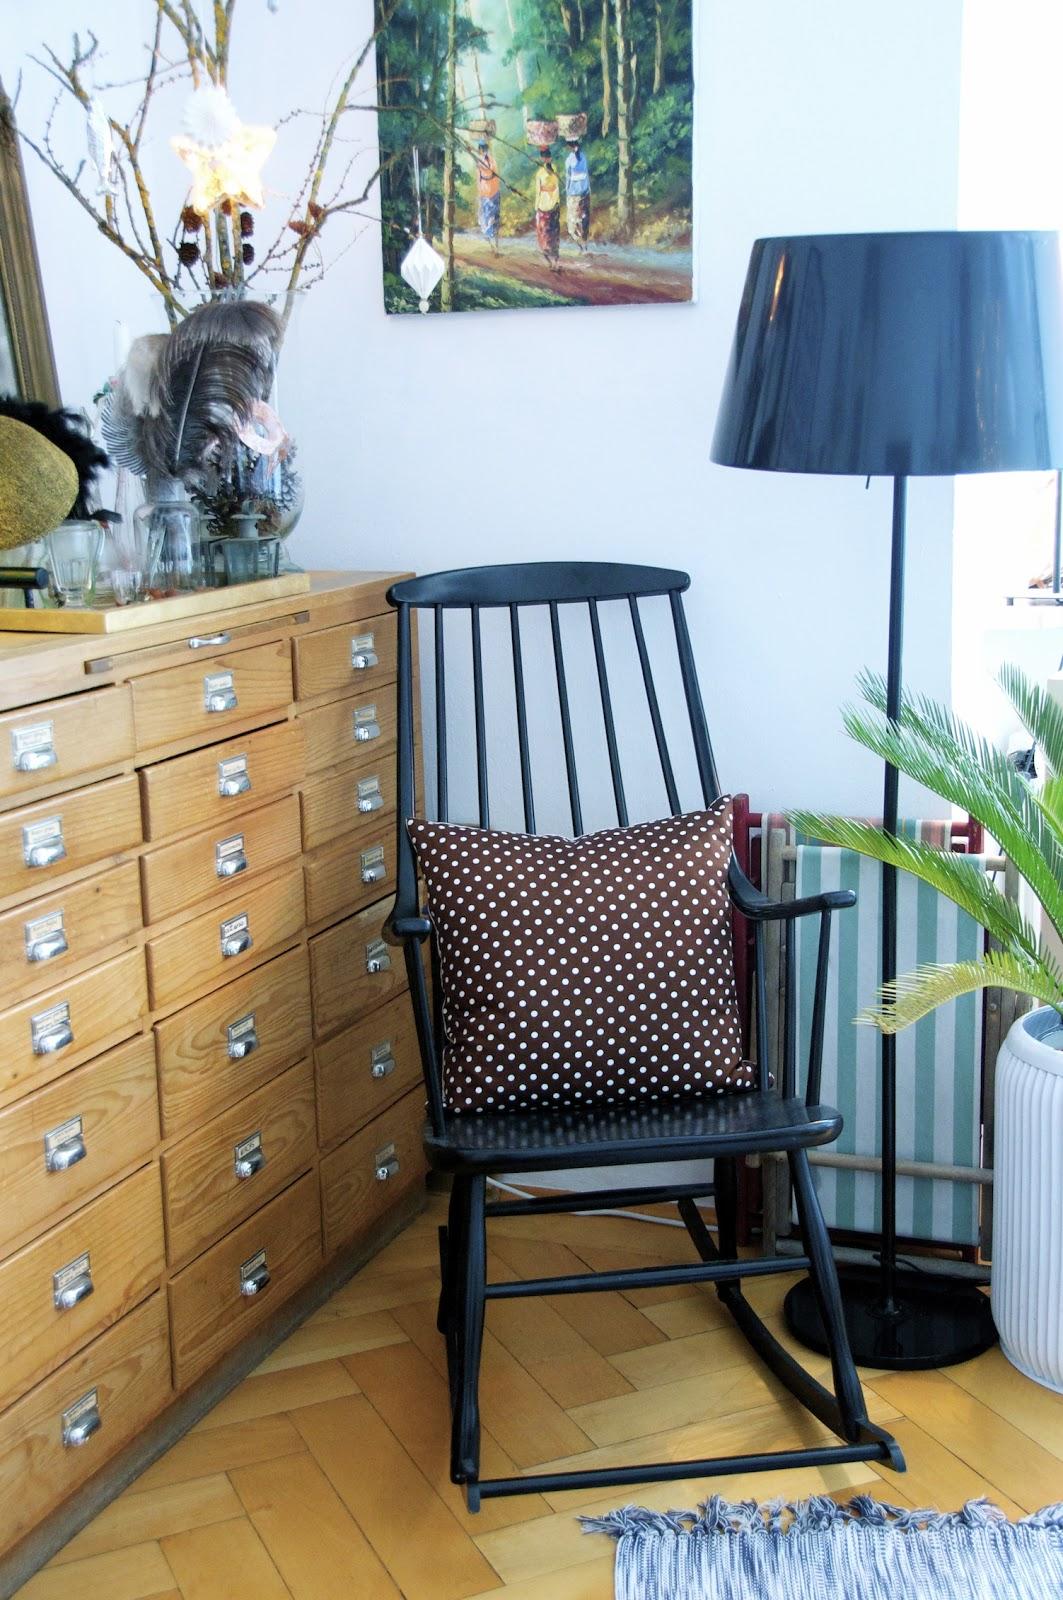 kleine schwester frage foto freitag mit ohhh mhhh. Black Bedroom Furniture Sets. Home Design Ideas